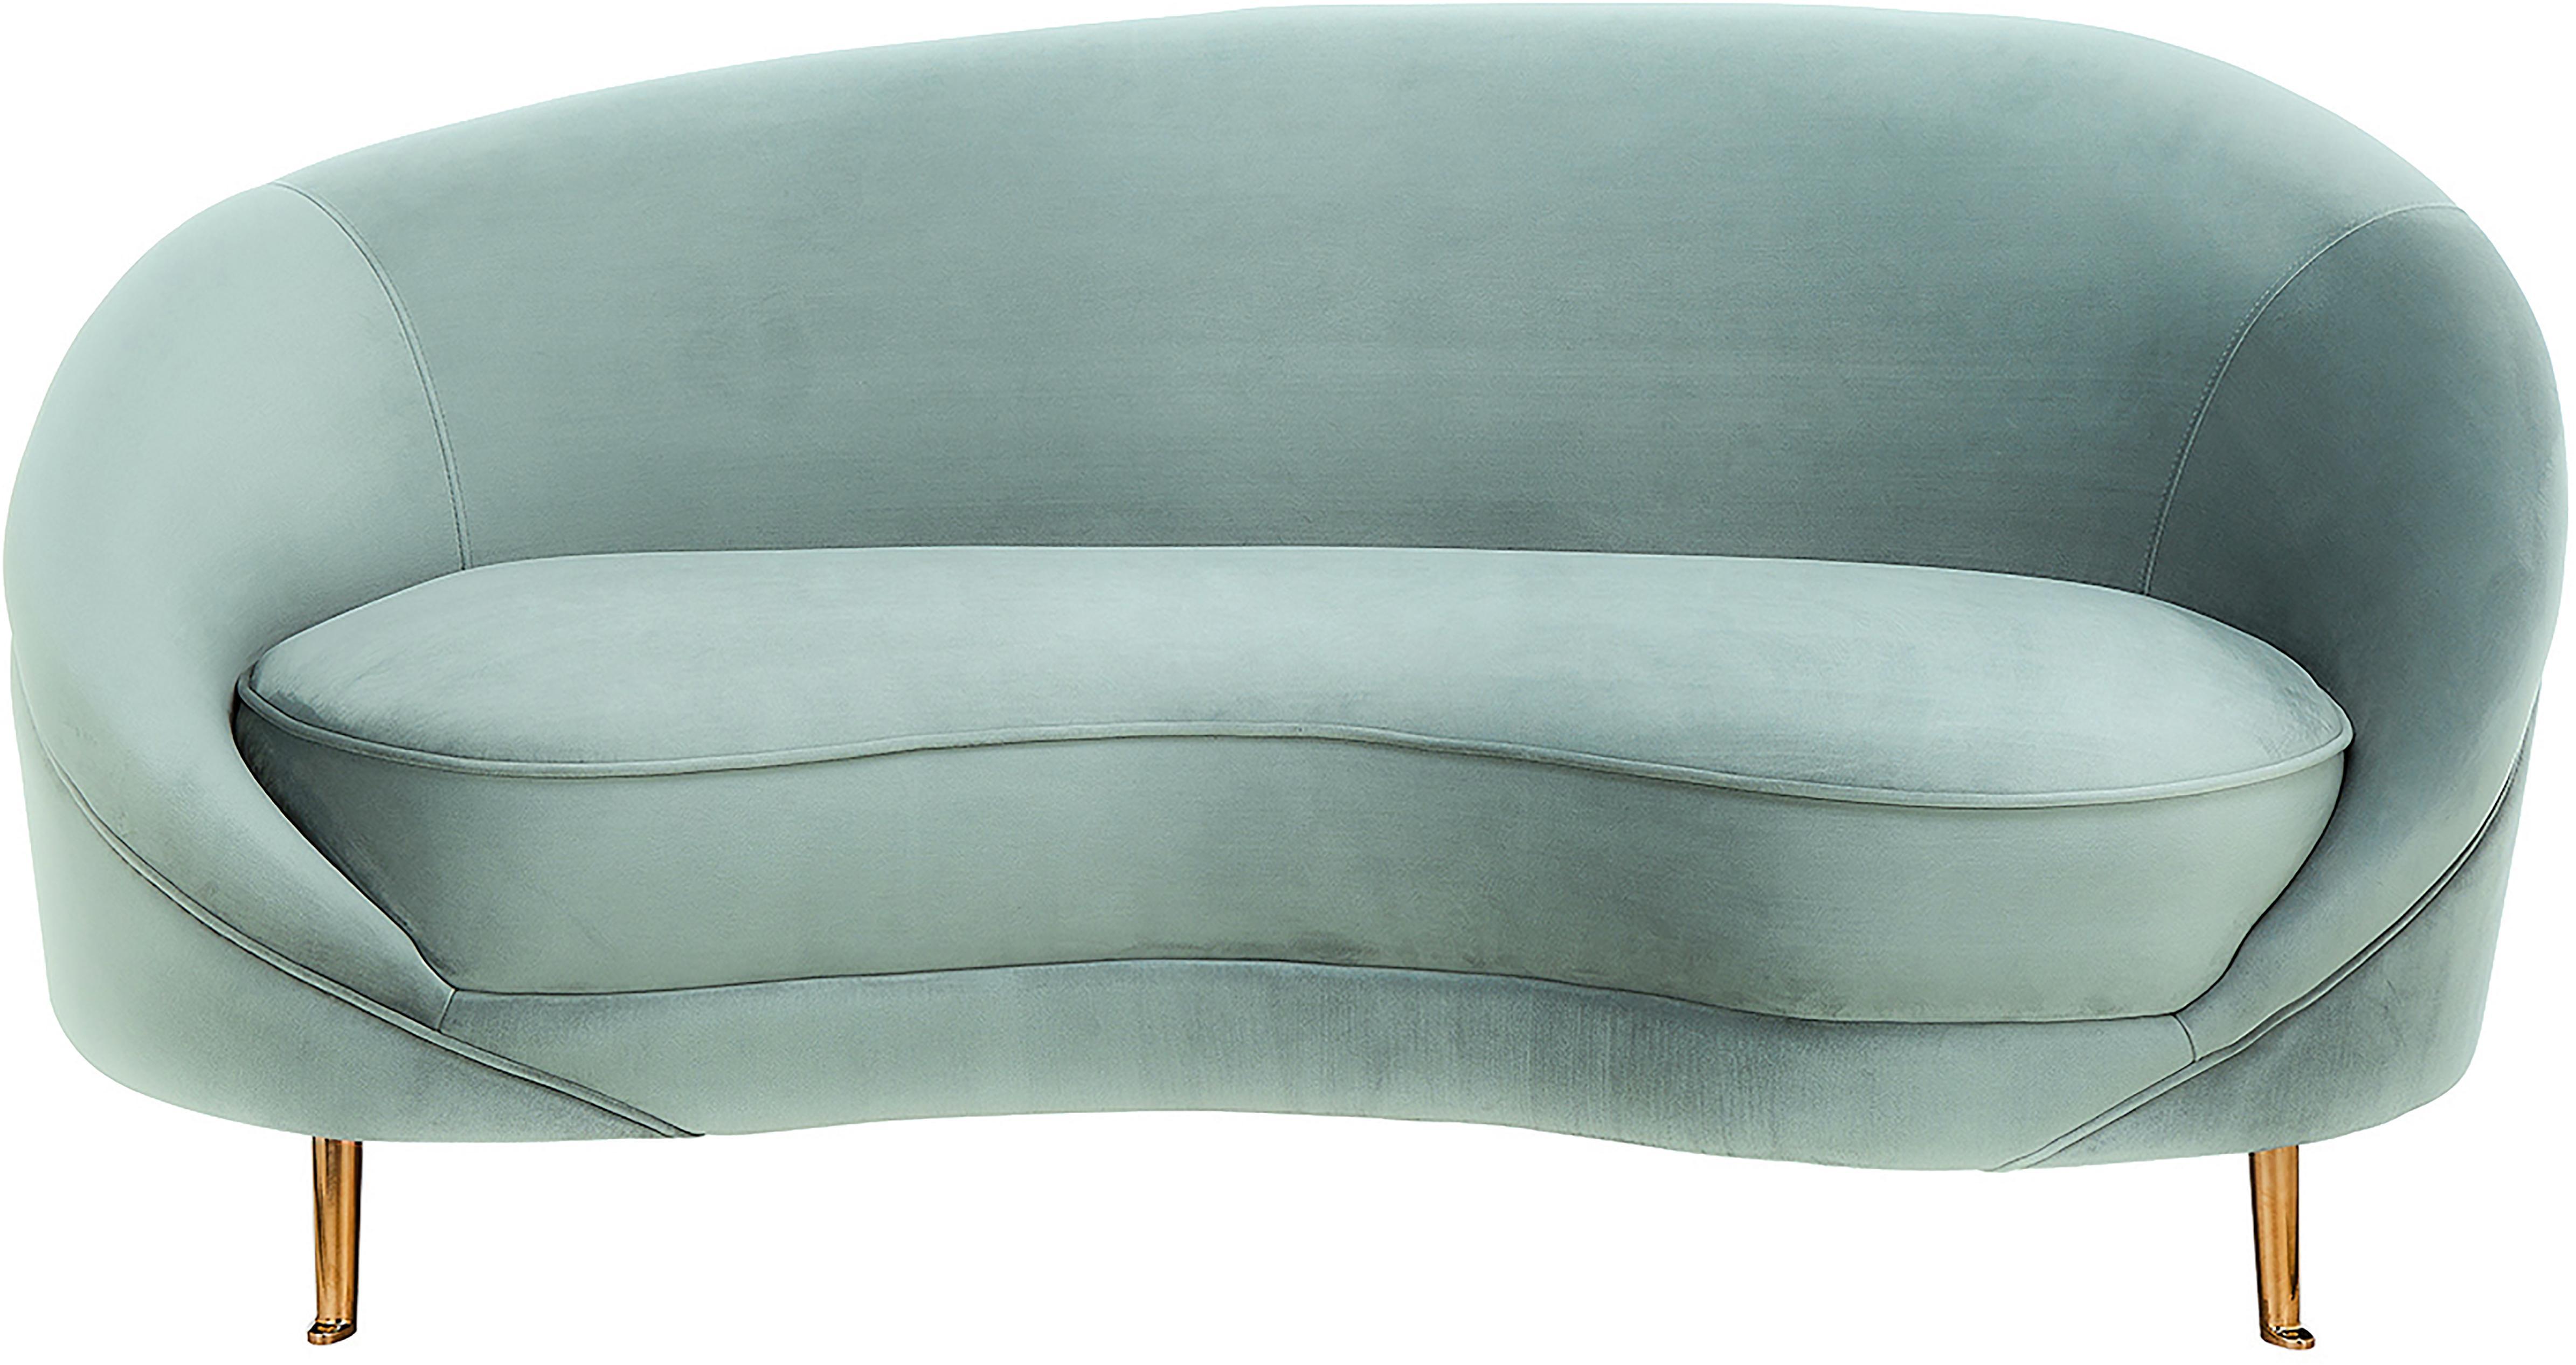 Samt-Nierensofa Gatsby (2-Sitzer), Bezug: Samt (Polyester) 25.000 S, Gestell: Massives Eukalyptusholz, Füße: Metall, galvanisiert, Samt Türkis, B 173 x T 87 cm